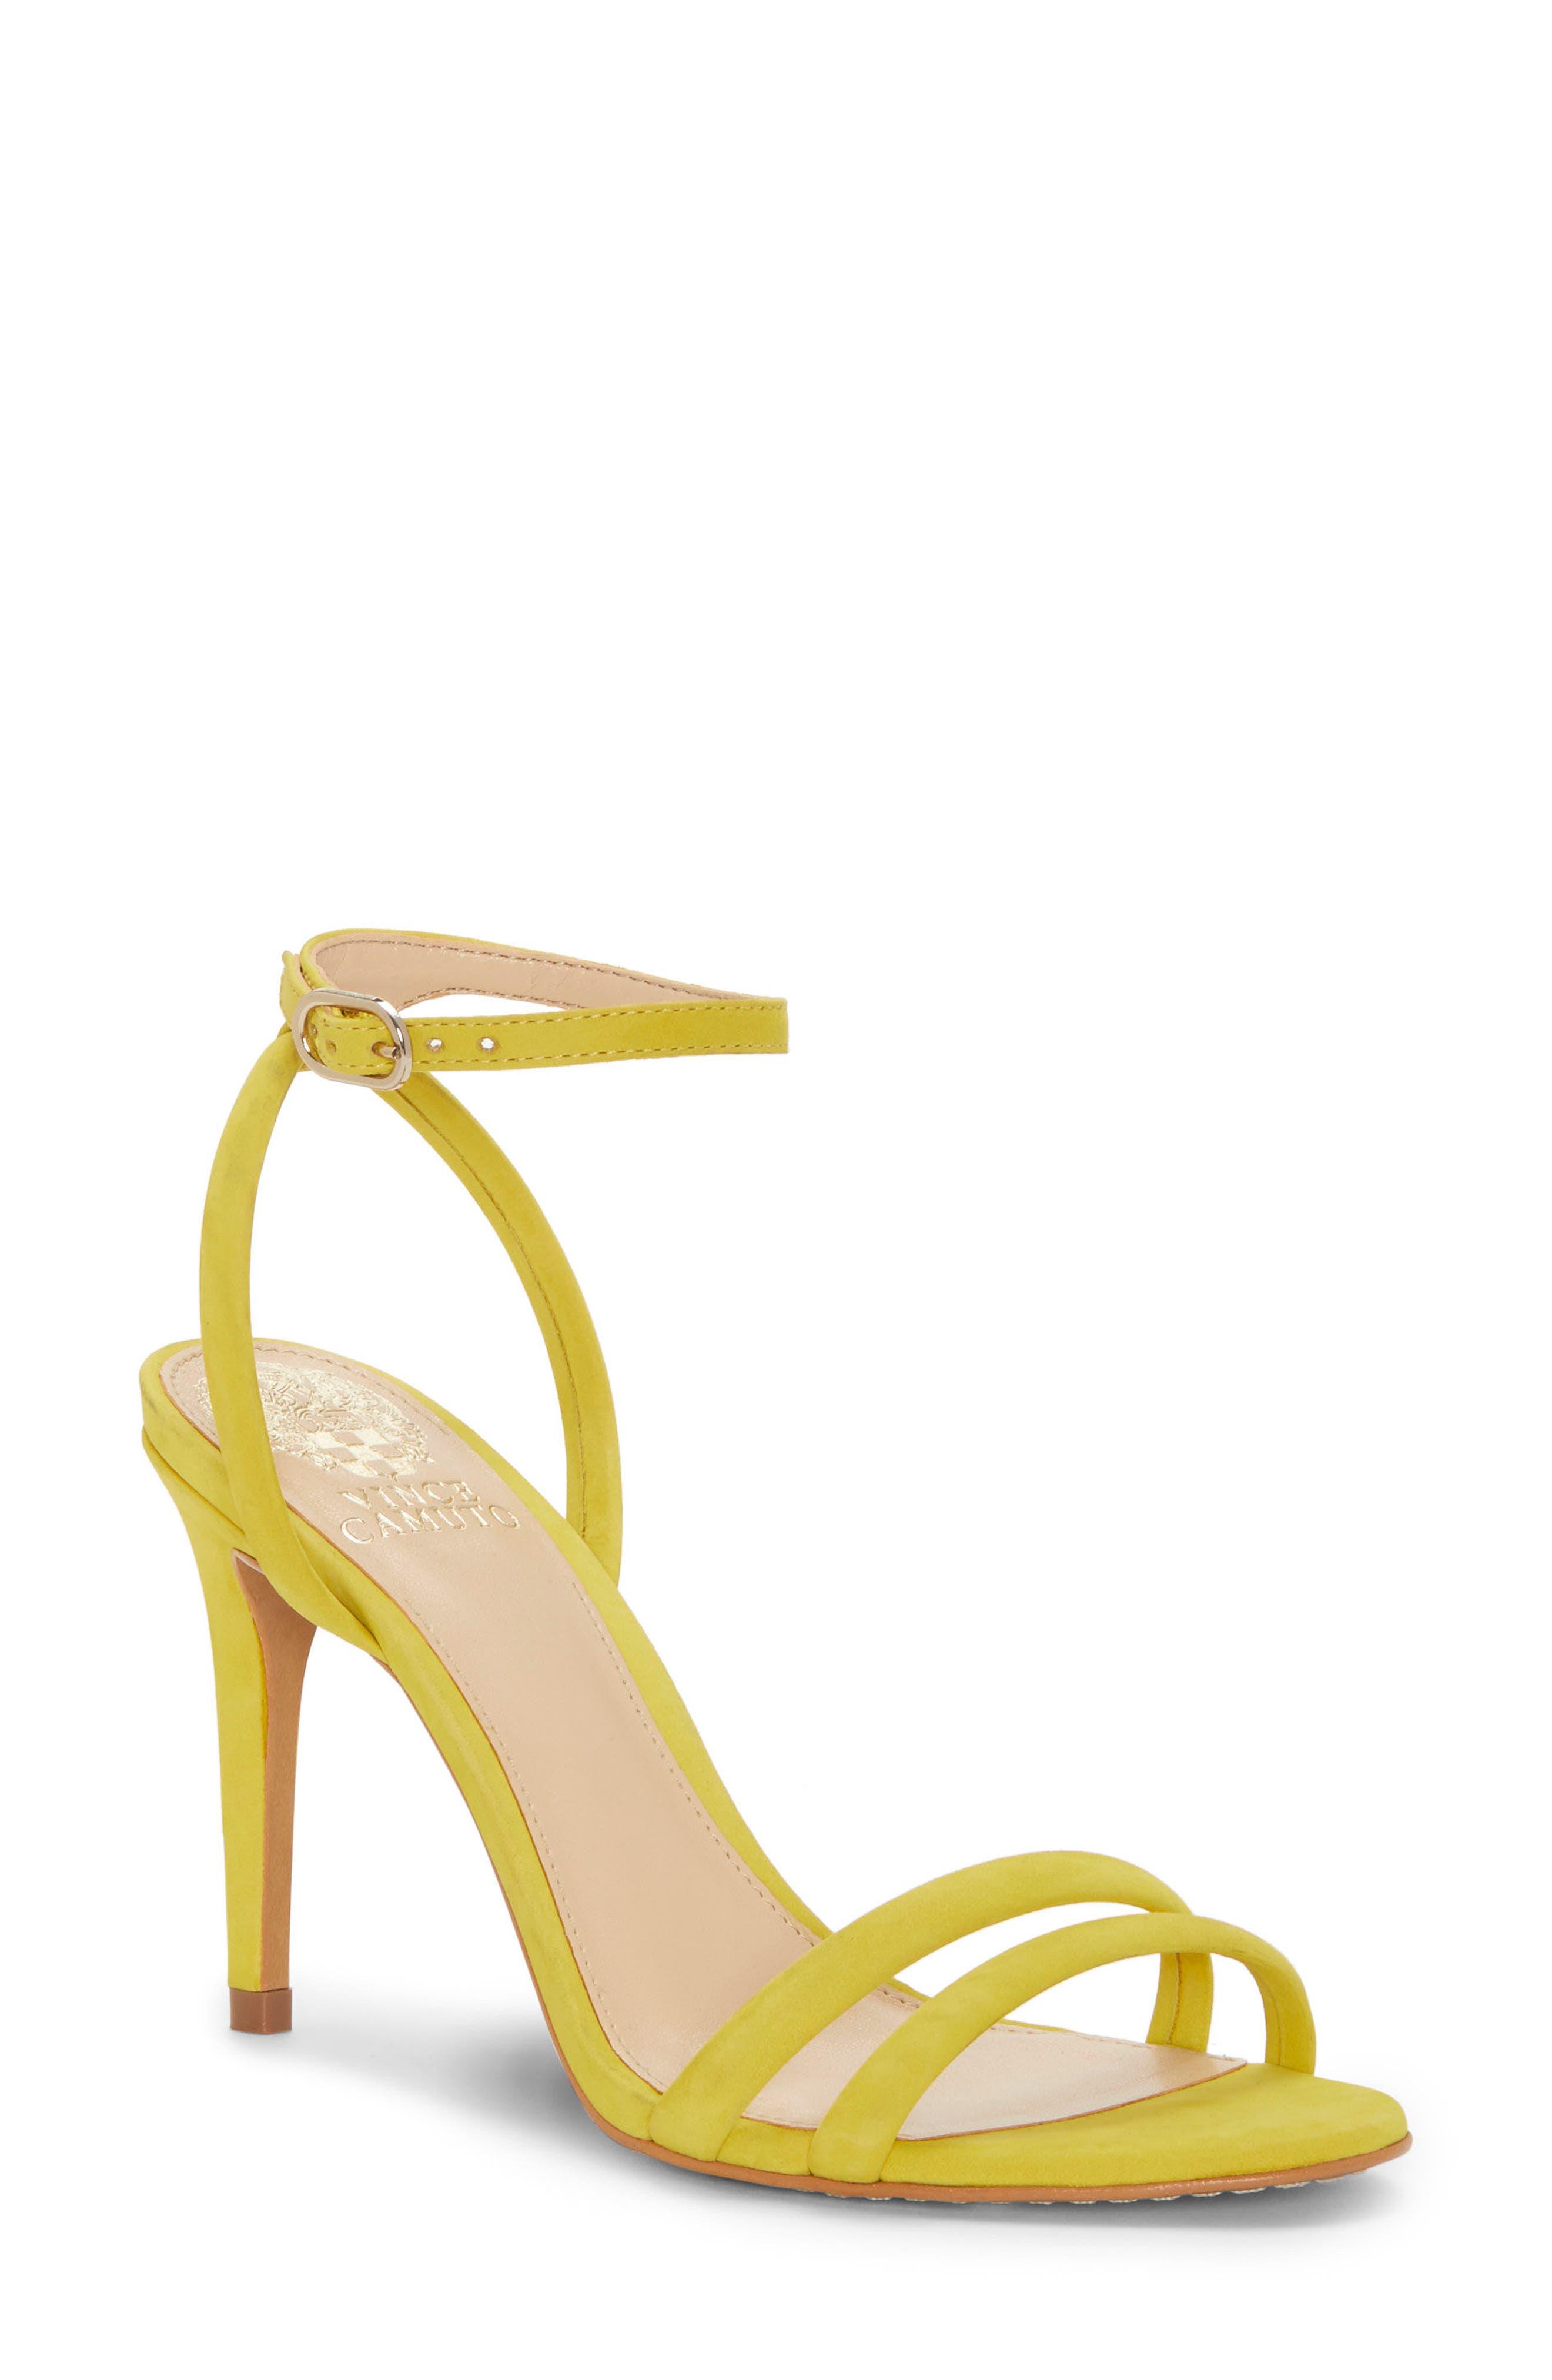 Kareenat Sandal,                             Main thumbnail 1, color,                             Yellow Nubuck Leather